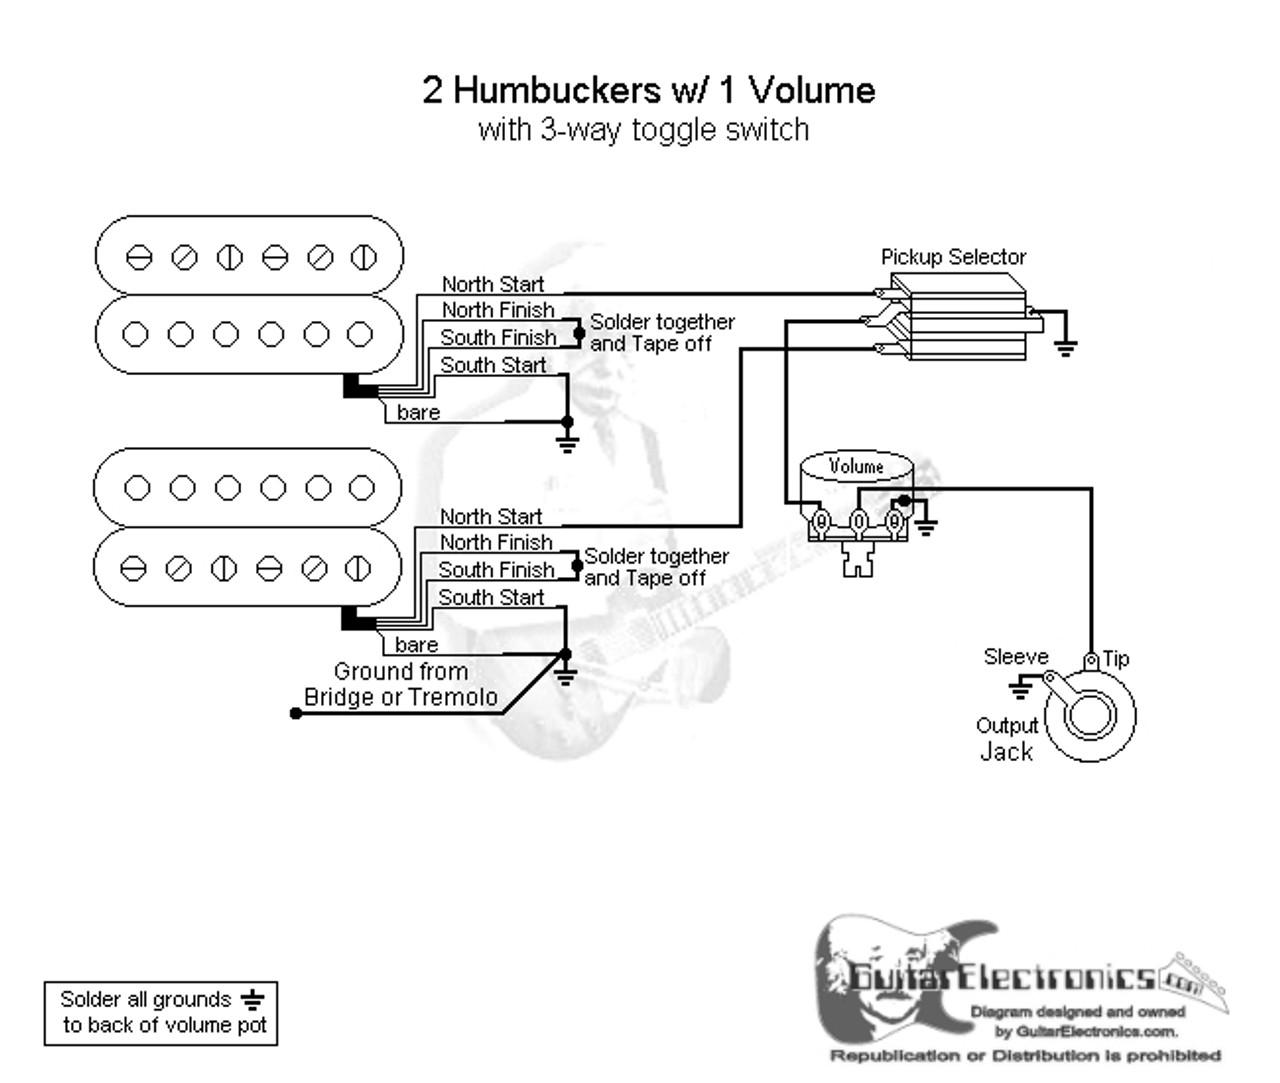 small resolution of humbucker single 1 volume 3 way switch wiring diagram humbuckers2 humbuckers 3 way toggle switch 1